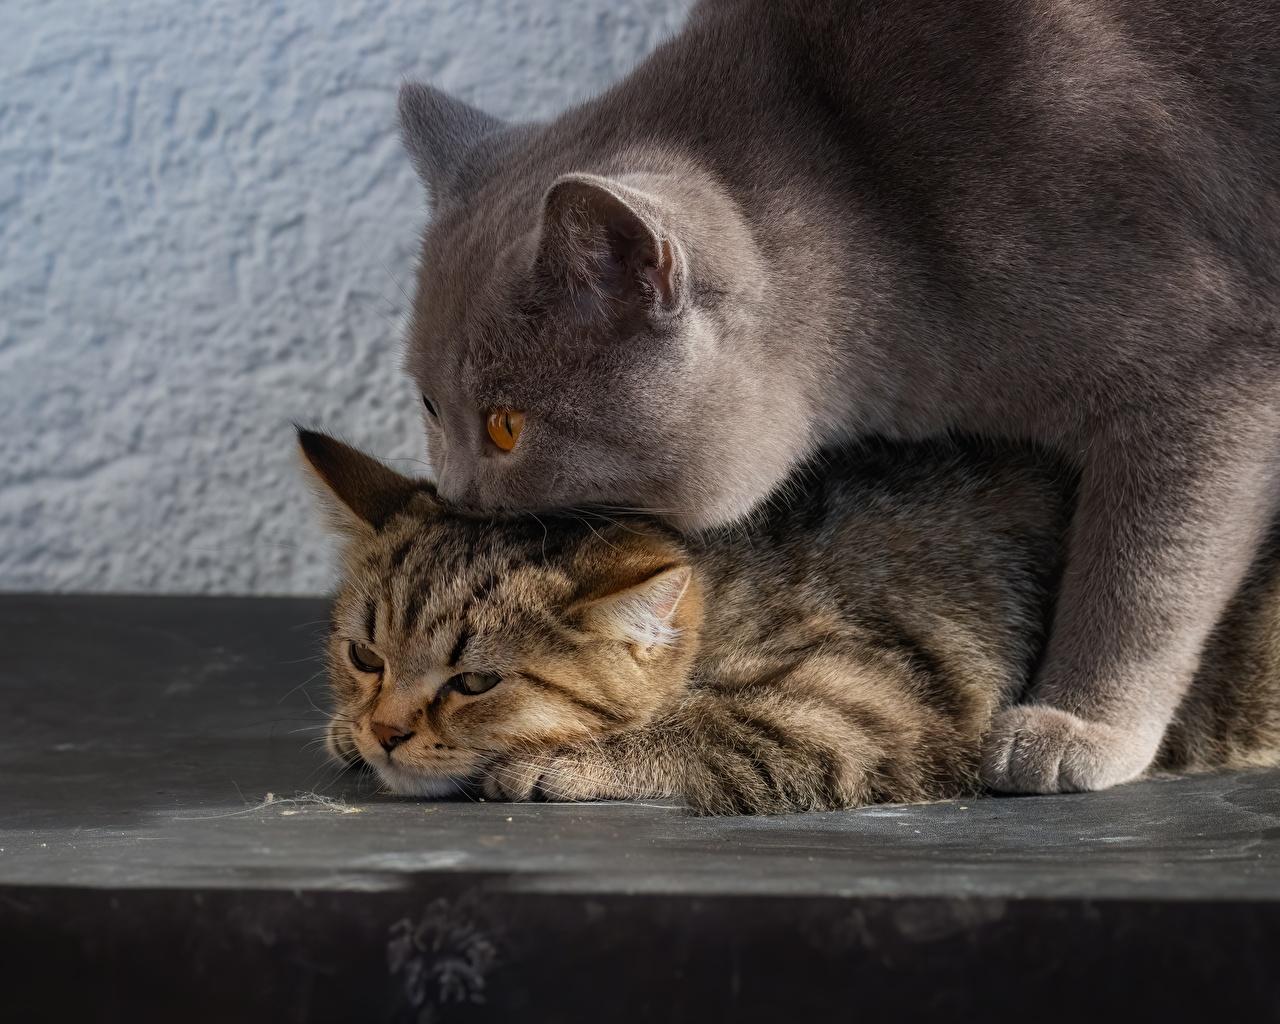 Image British Shorthair Cats 2 Animals cat Two animal